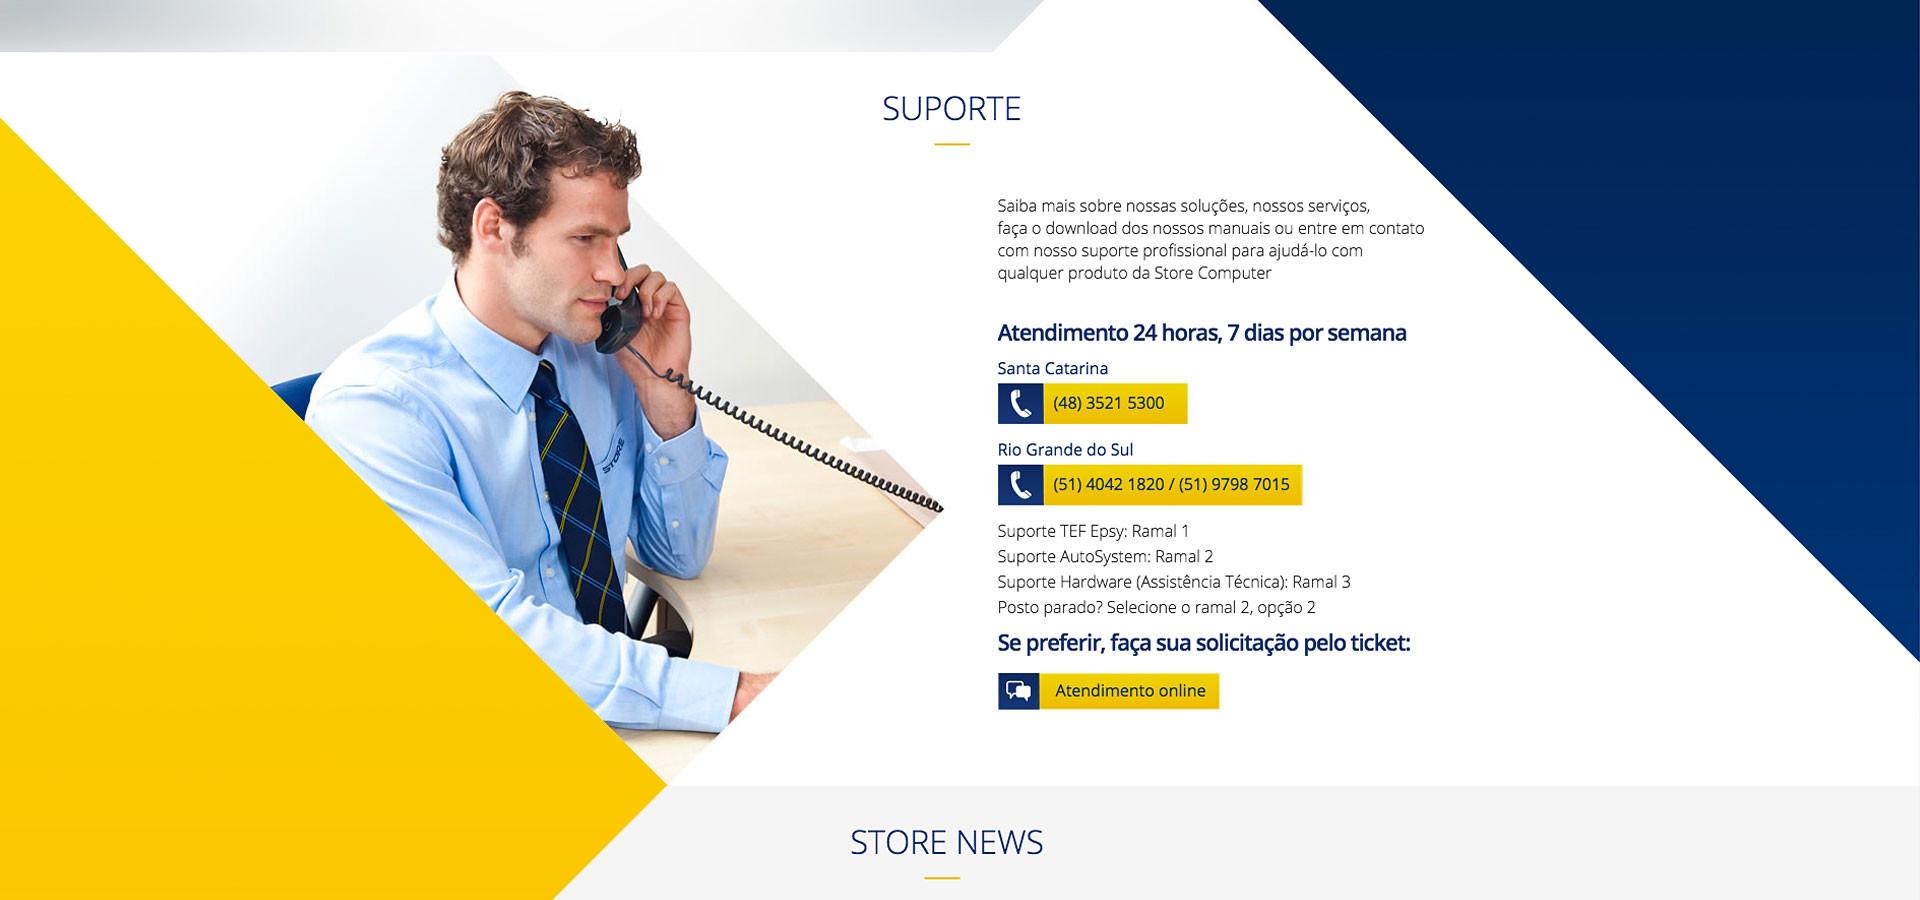 Suporte site Store Computer by Neurodigital